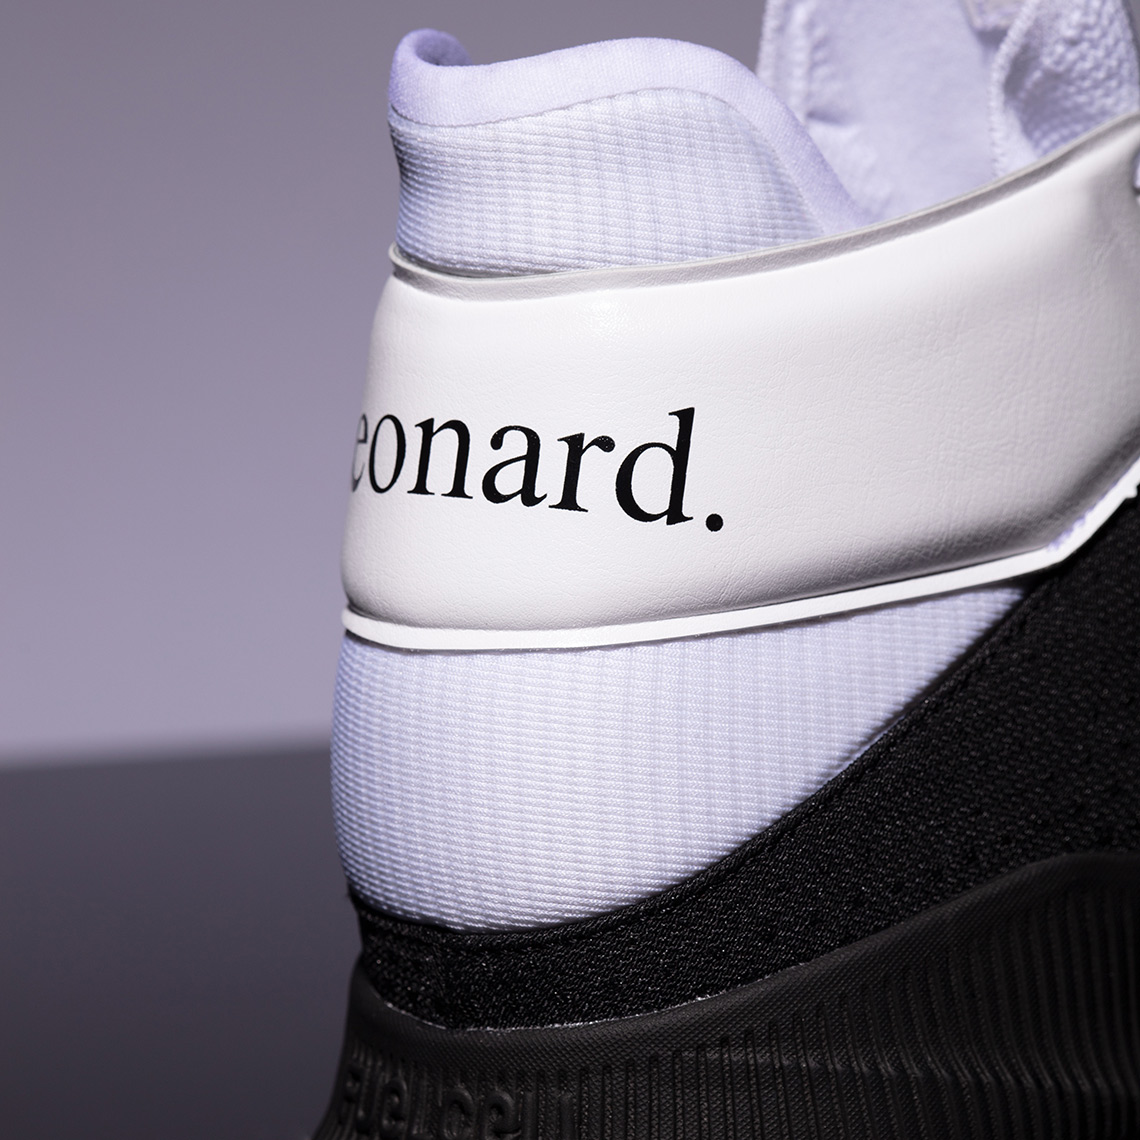 on sale 586f0 5b37c Kawhi Leonard New Balance Shoes - First Look + Release Info ...